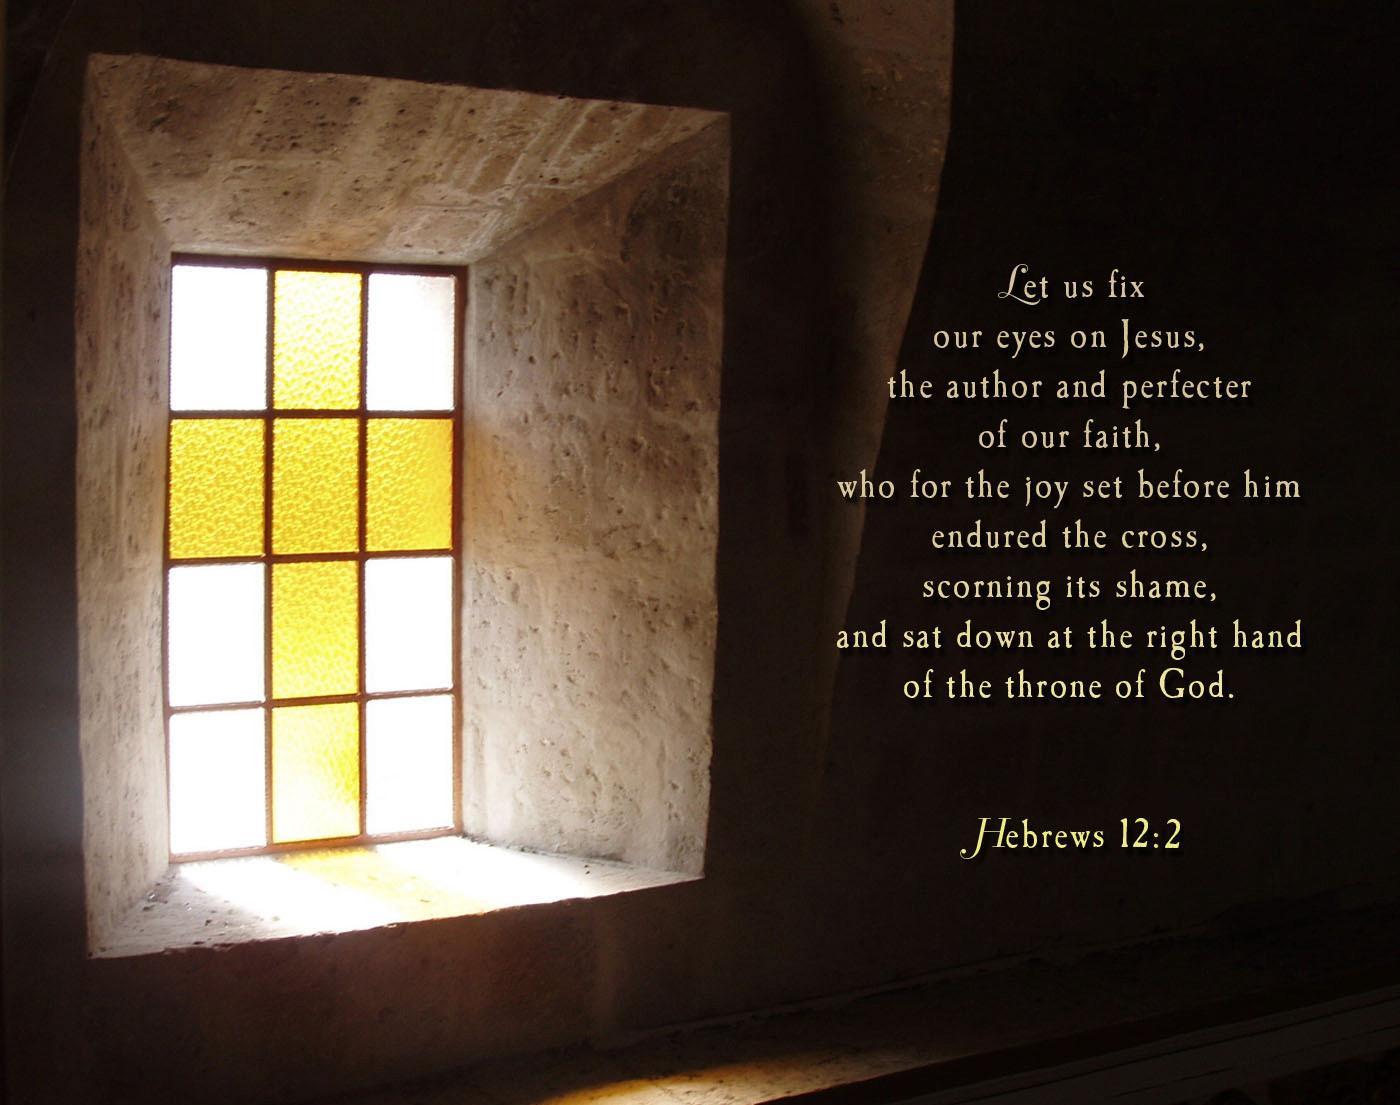 Hebrews 12 (New International Version)